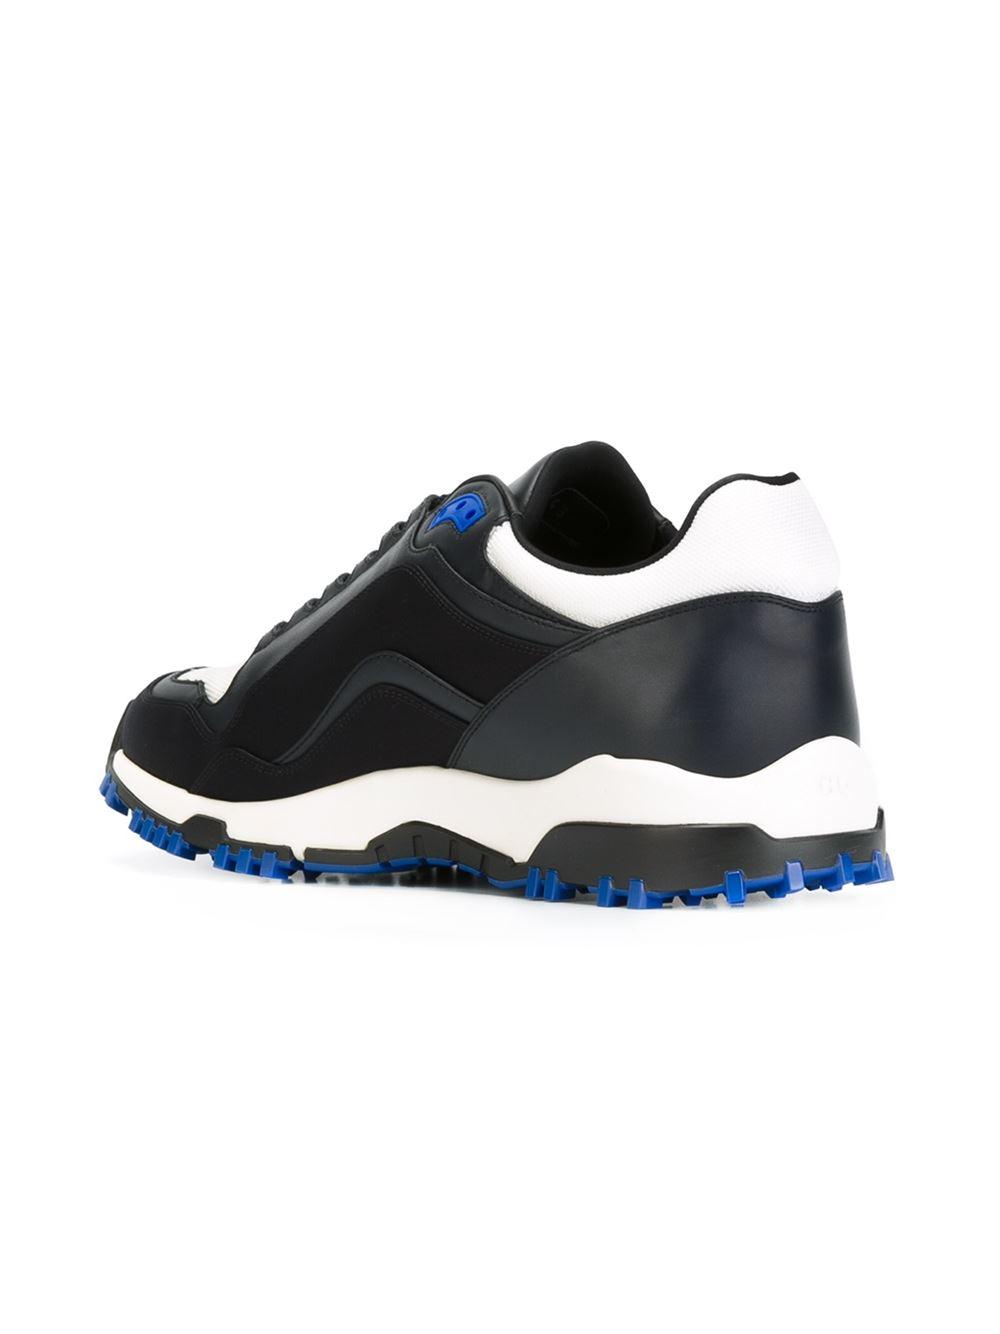 Sneakers dior homme 2015 - Labrocantederosalie.fr 53fccc8e6df